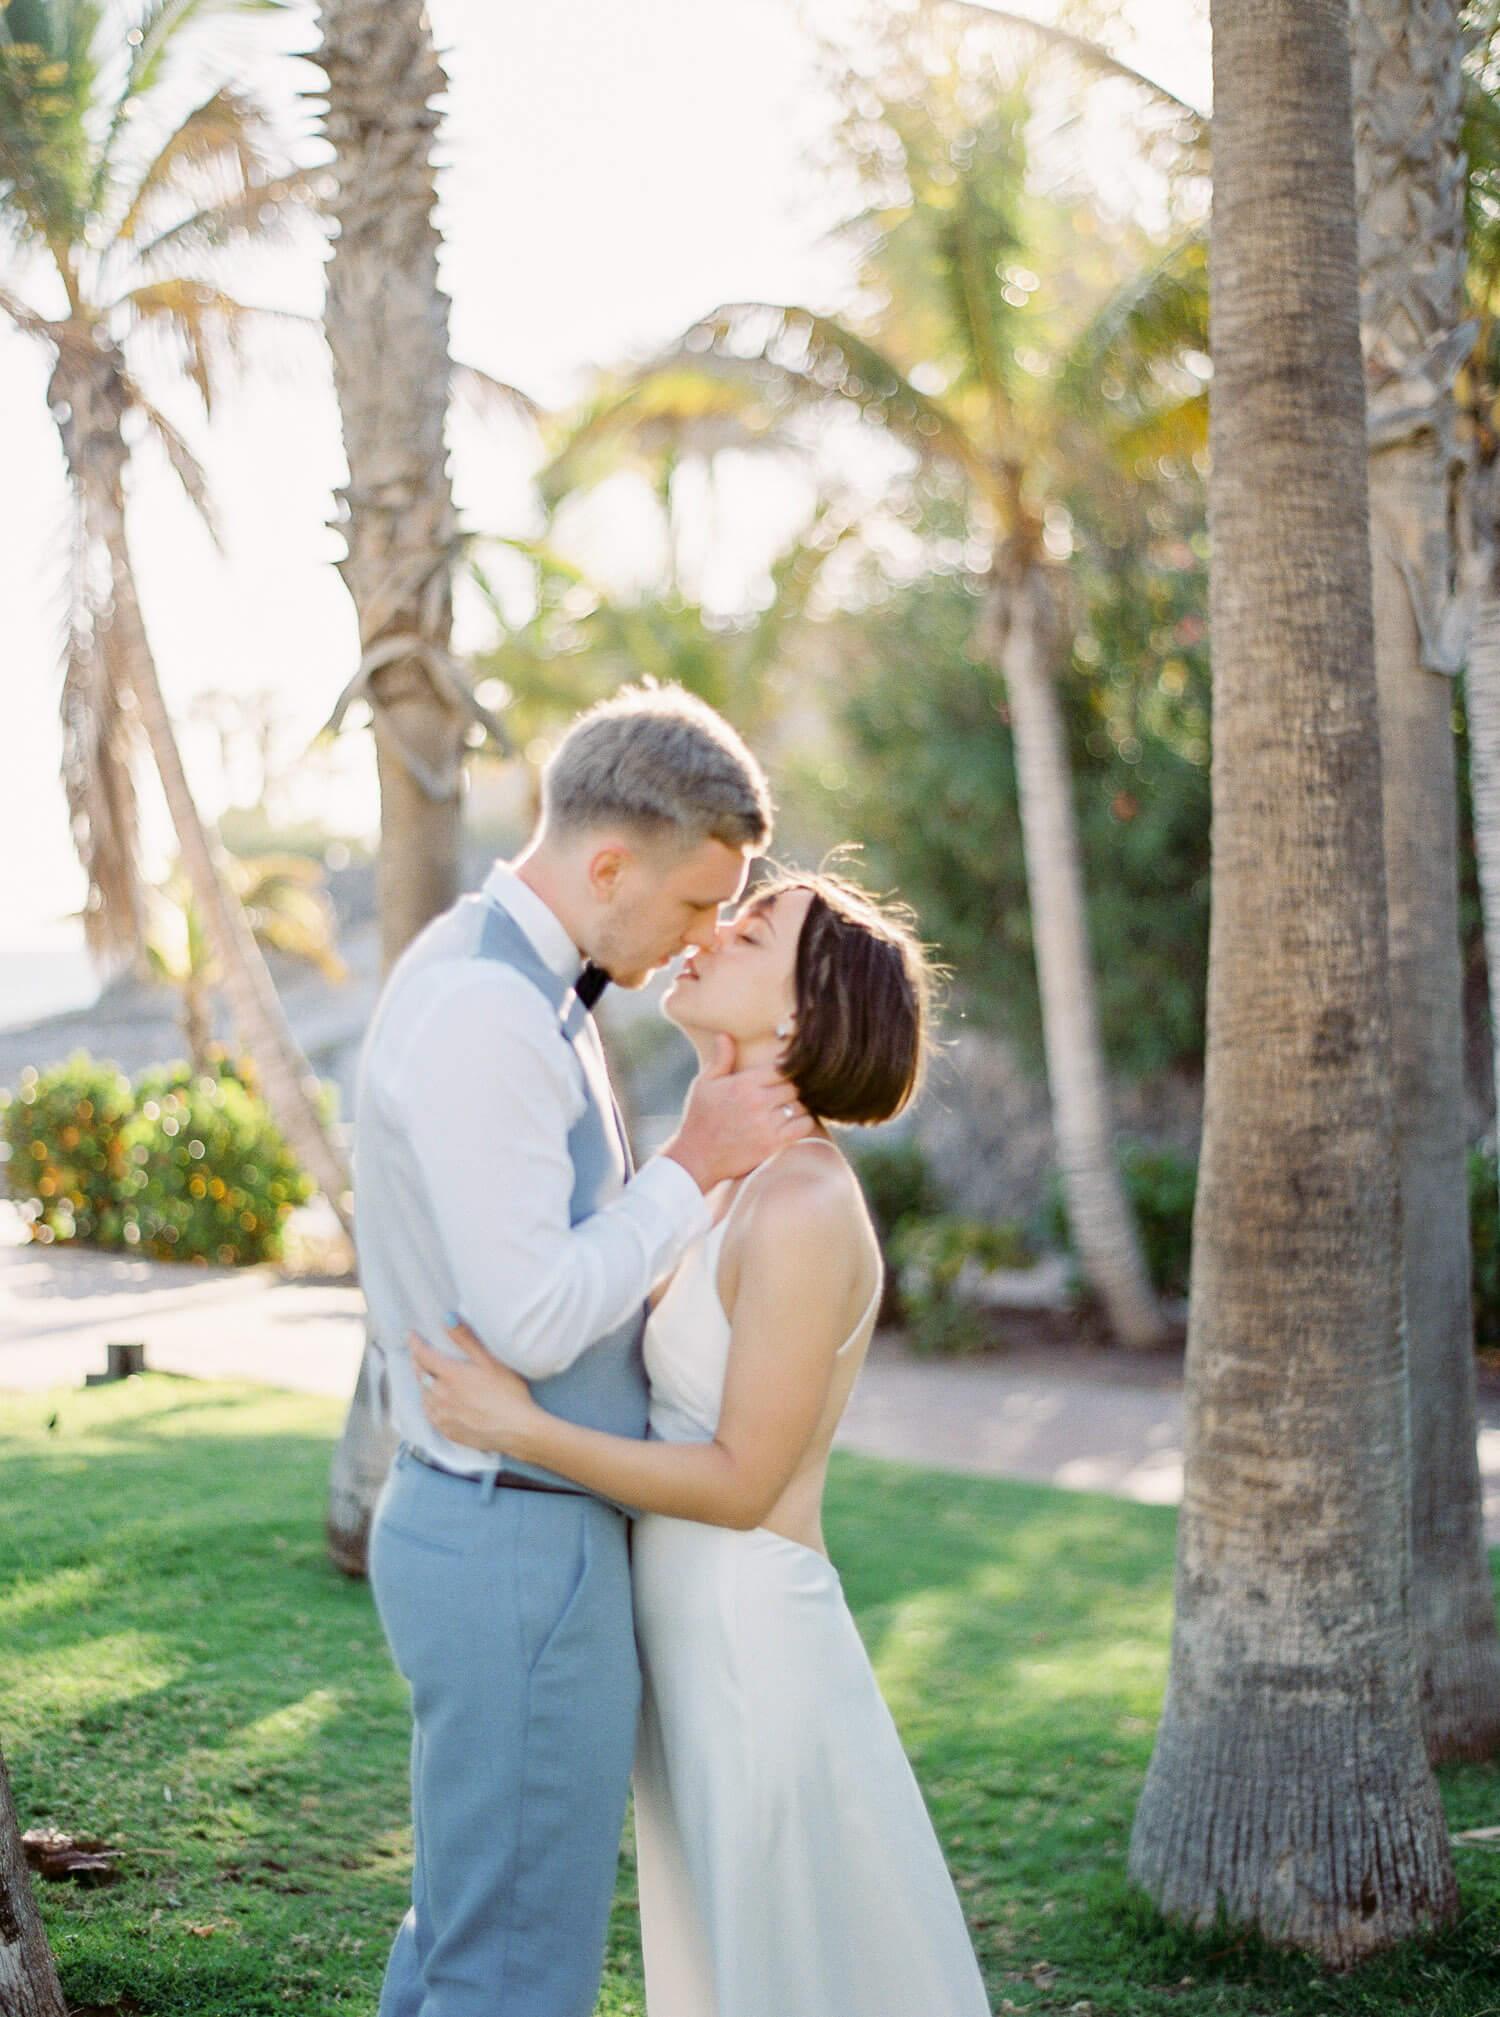 fine art wedding photographer in Tenerife Spain